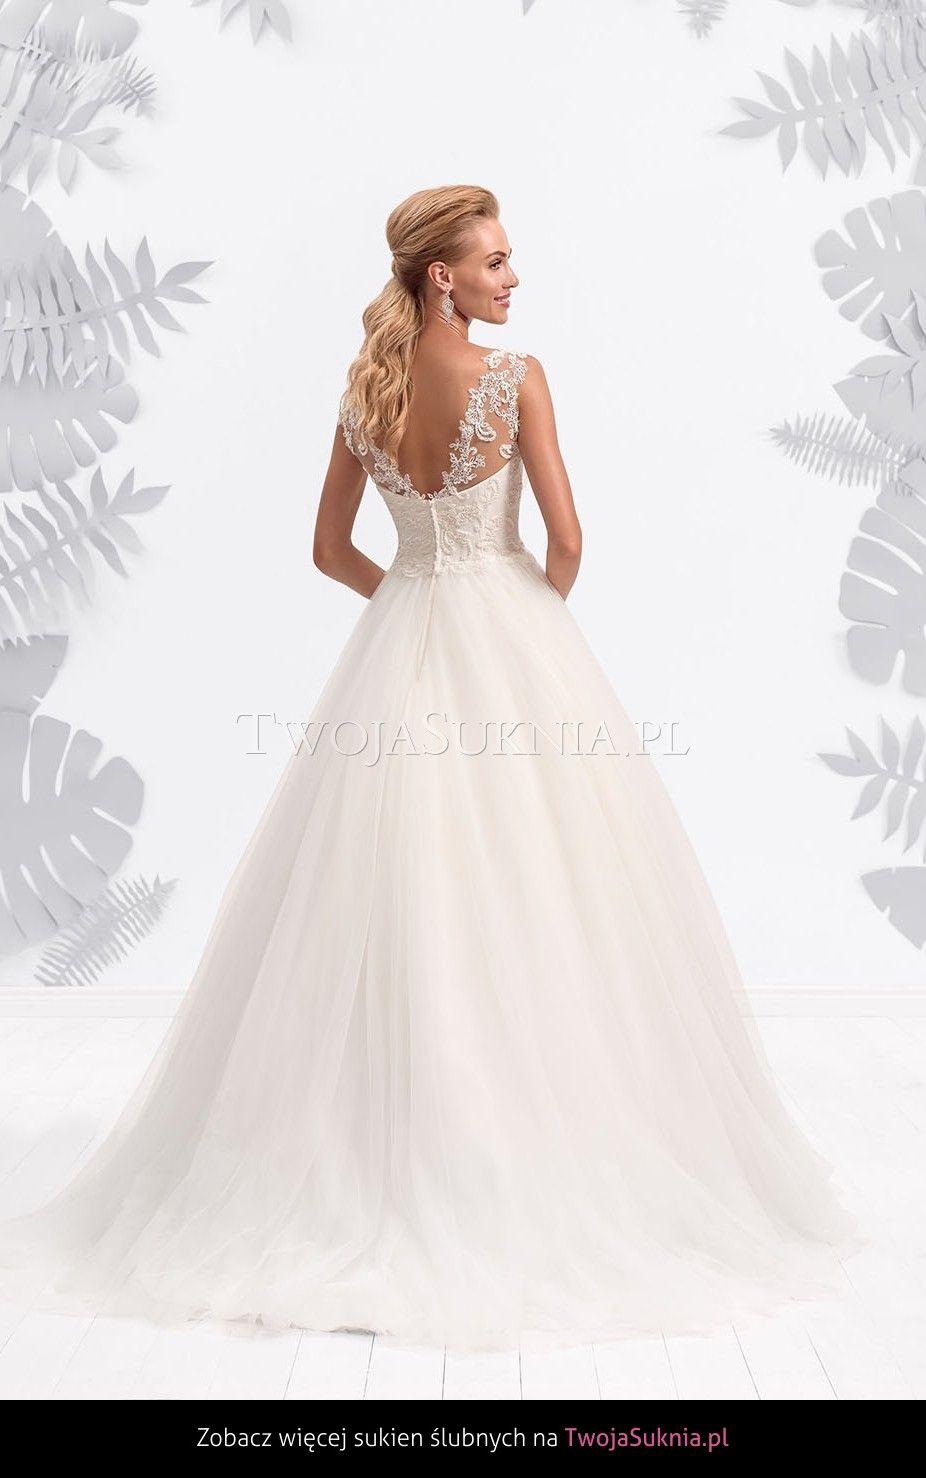 Elizabeth Passion 3471t 2017 Wedding Dresses Flower Girl Dresses Dresses